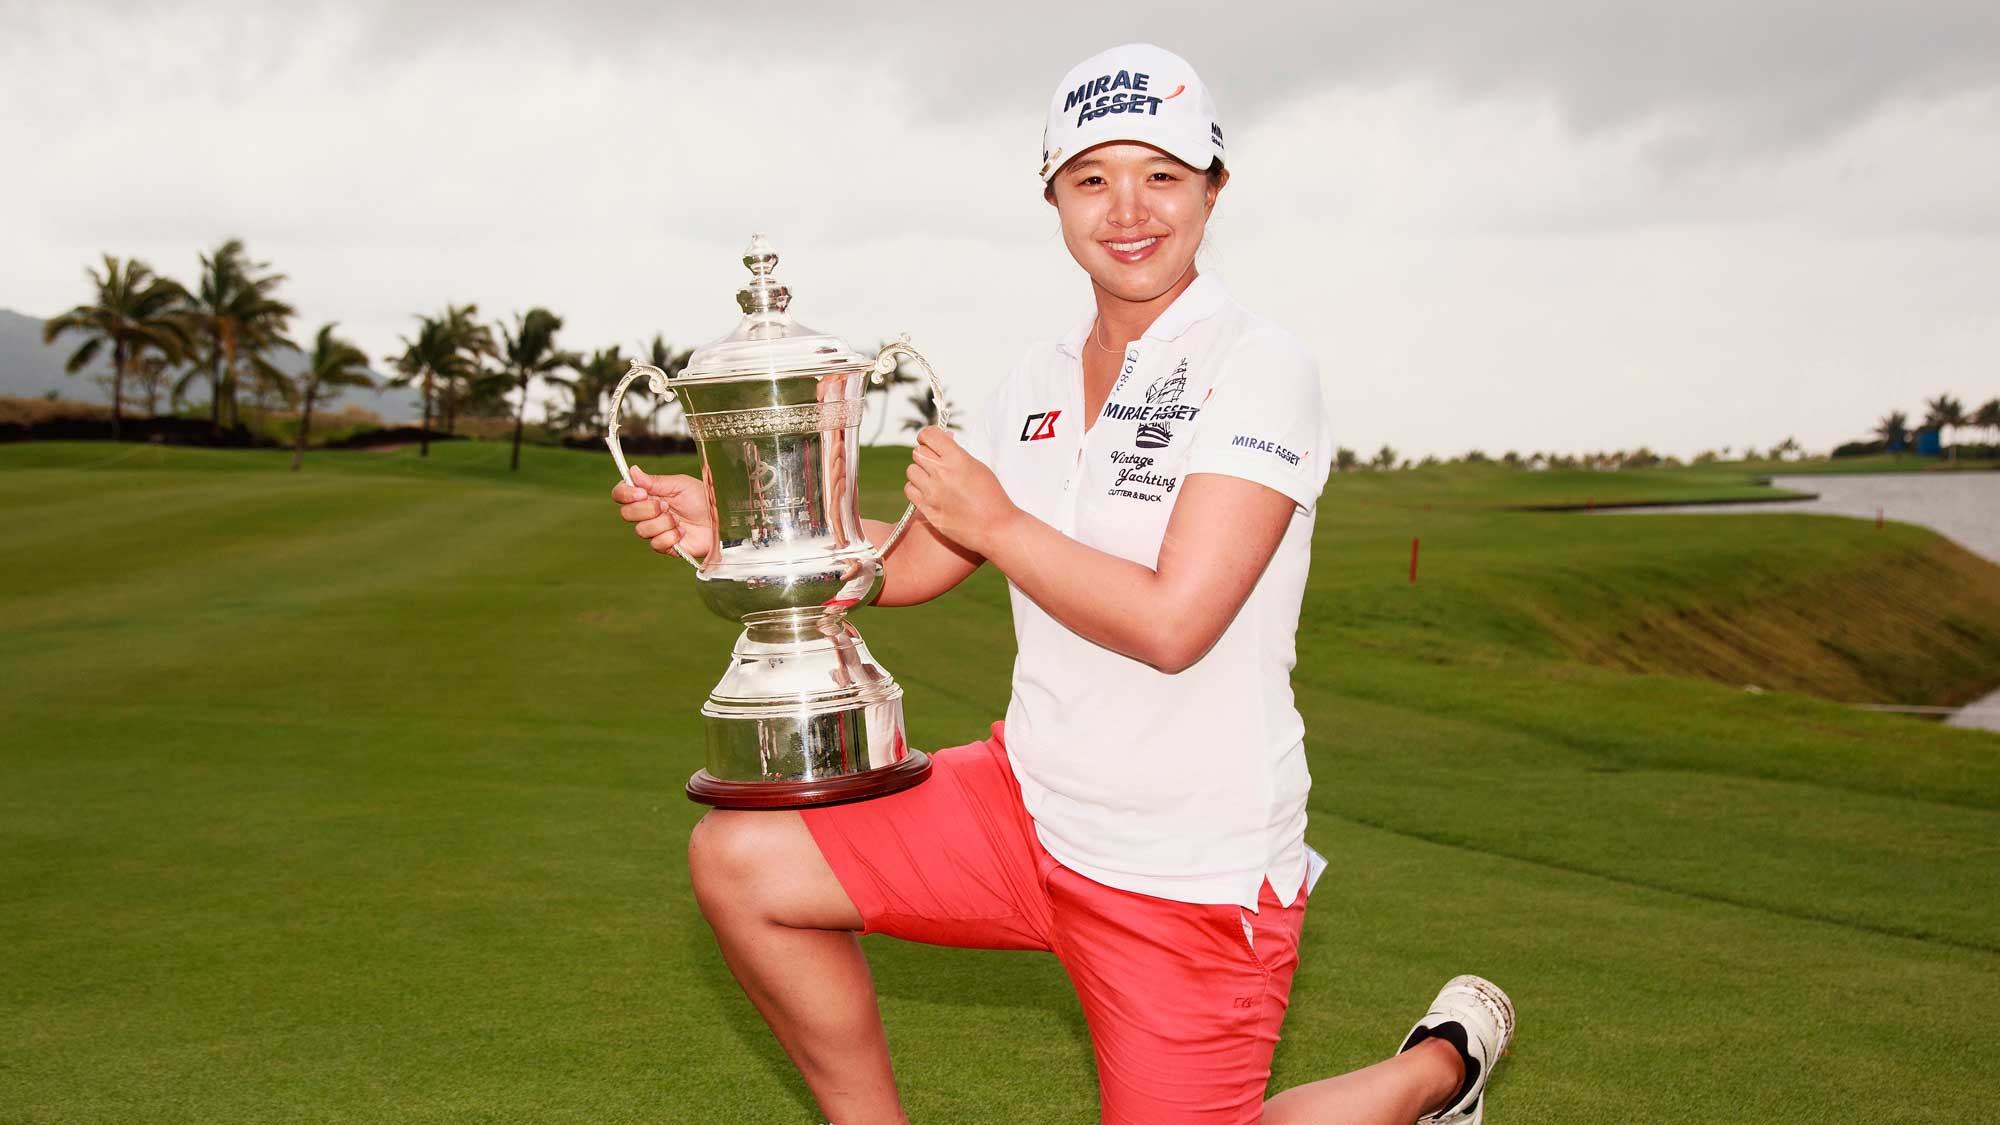 Blue Bay LPGA defending champion Sei Young Kim